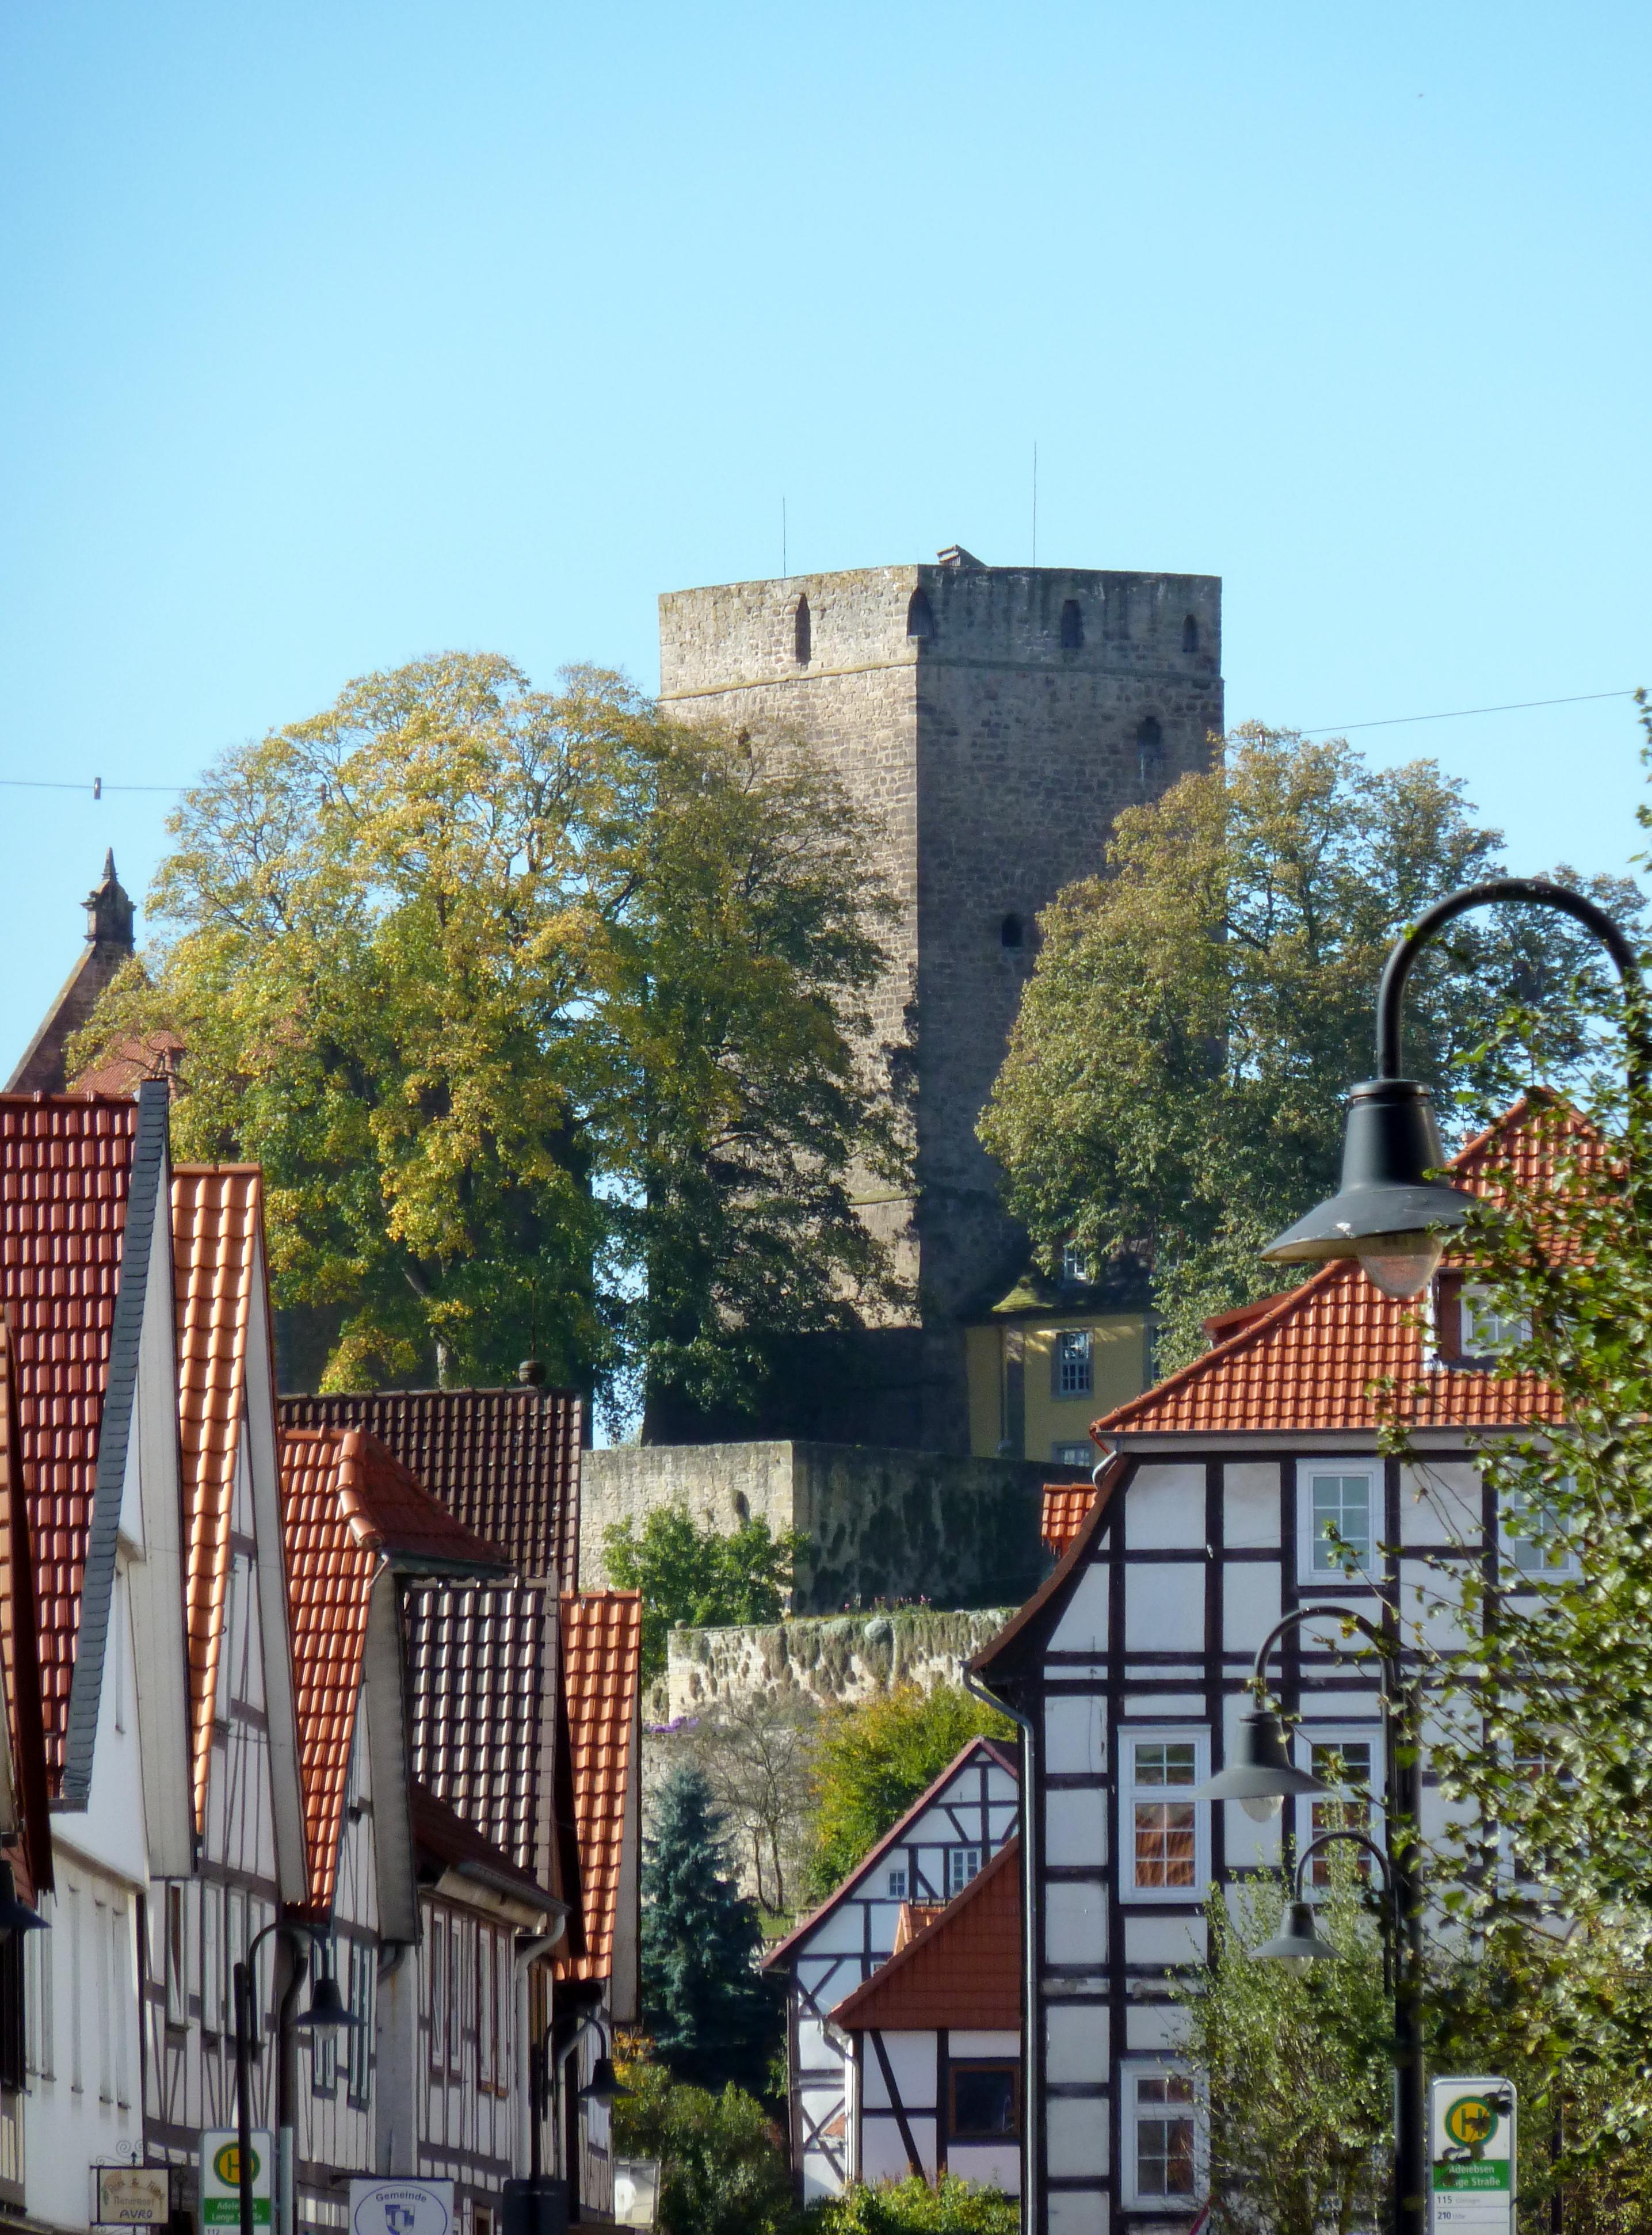 File Adelebsen Burg 02 Jpg Wikimedia Commons